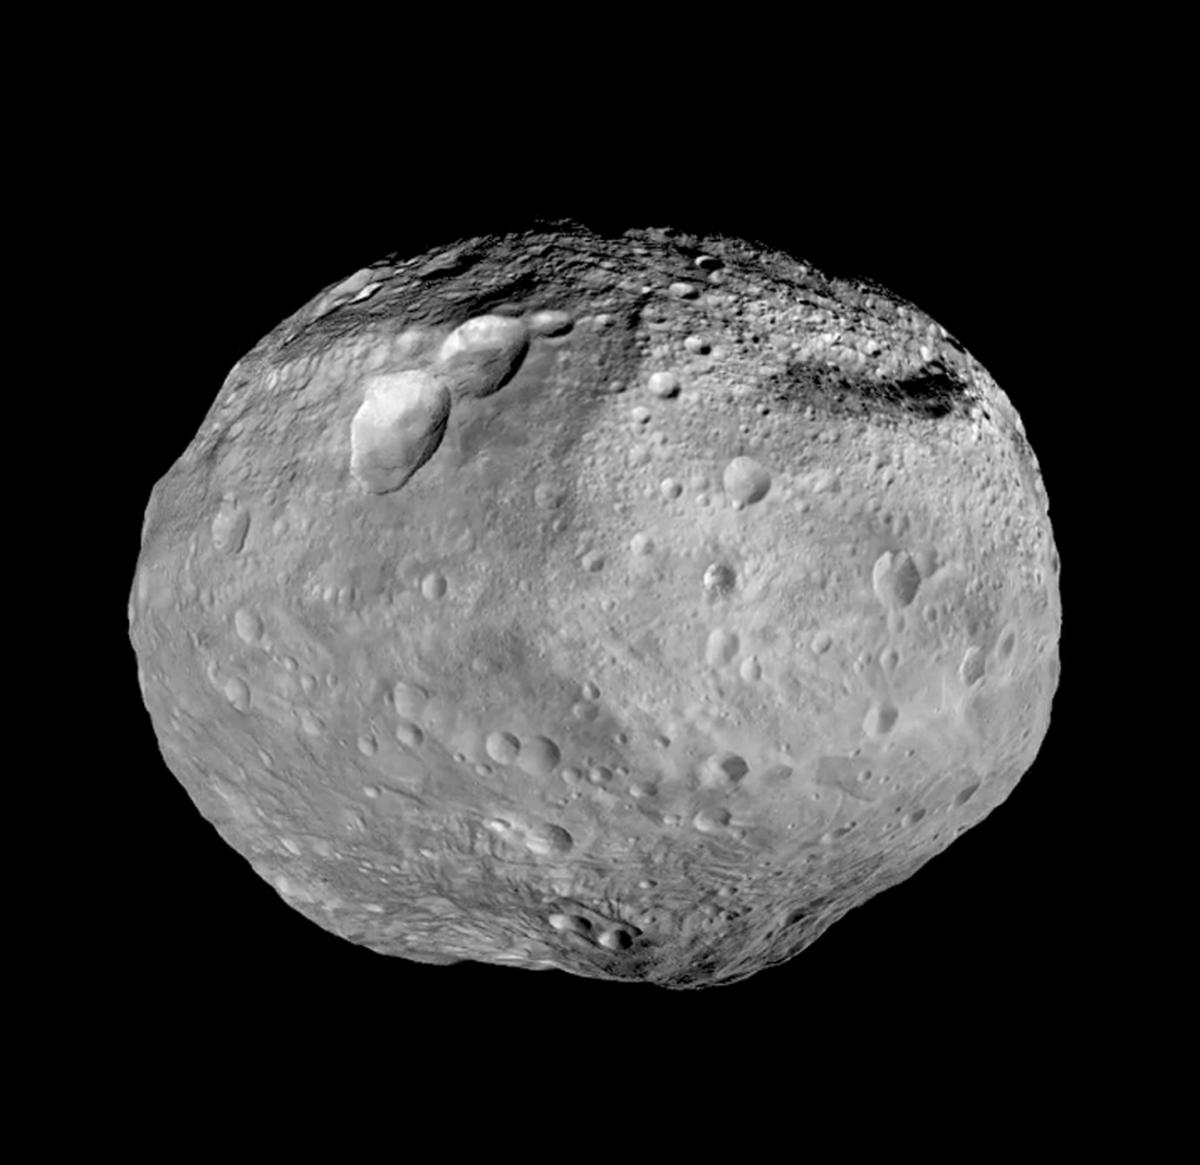 Астероид Апофис не заденет Землю